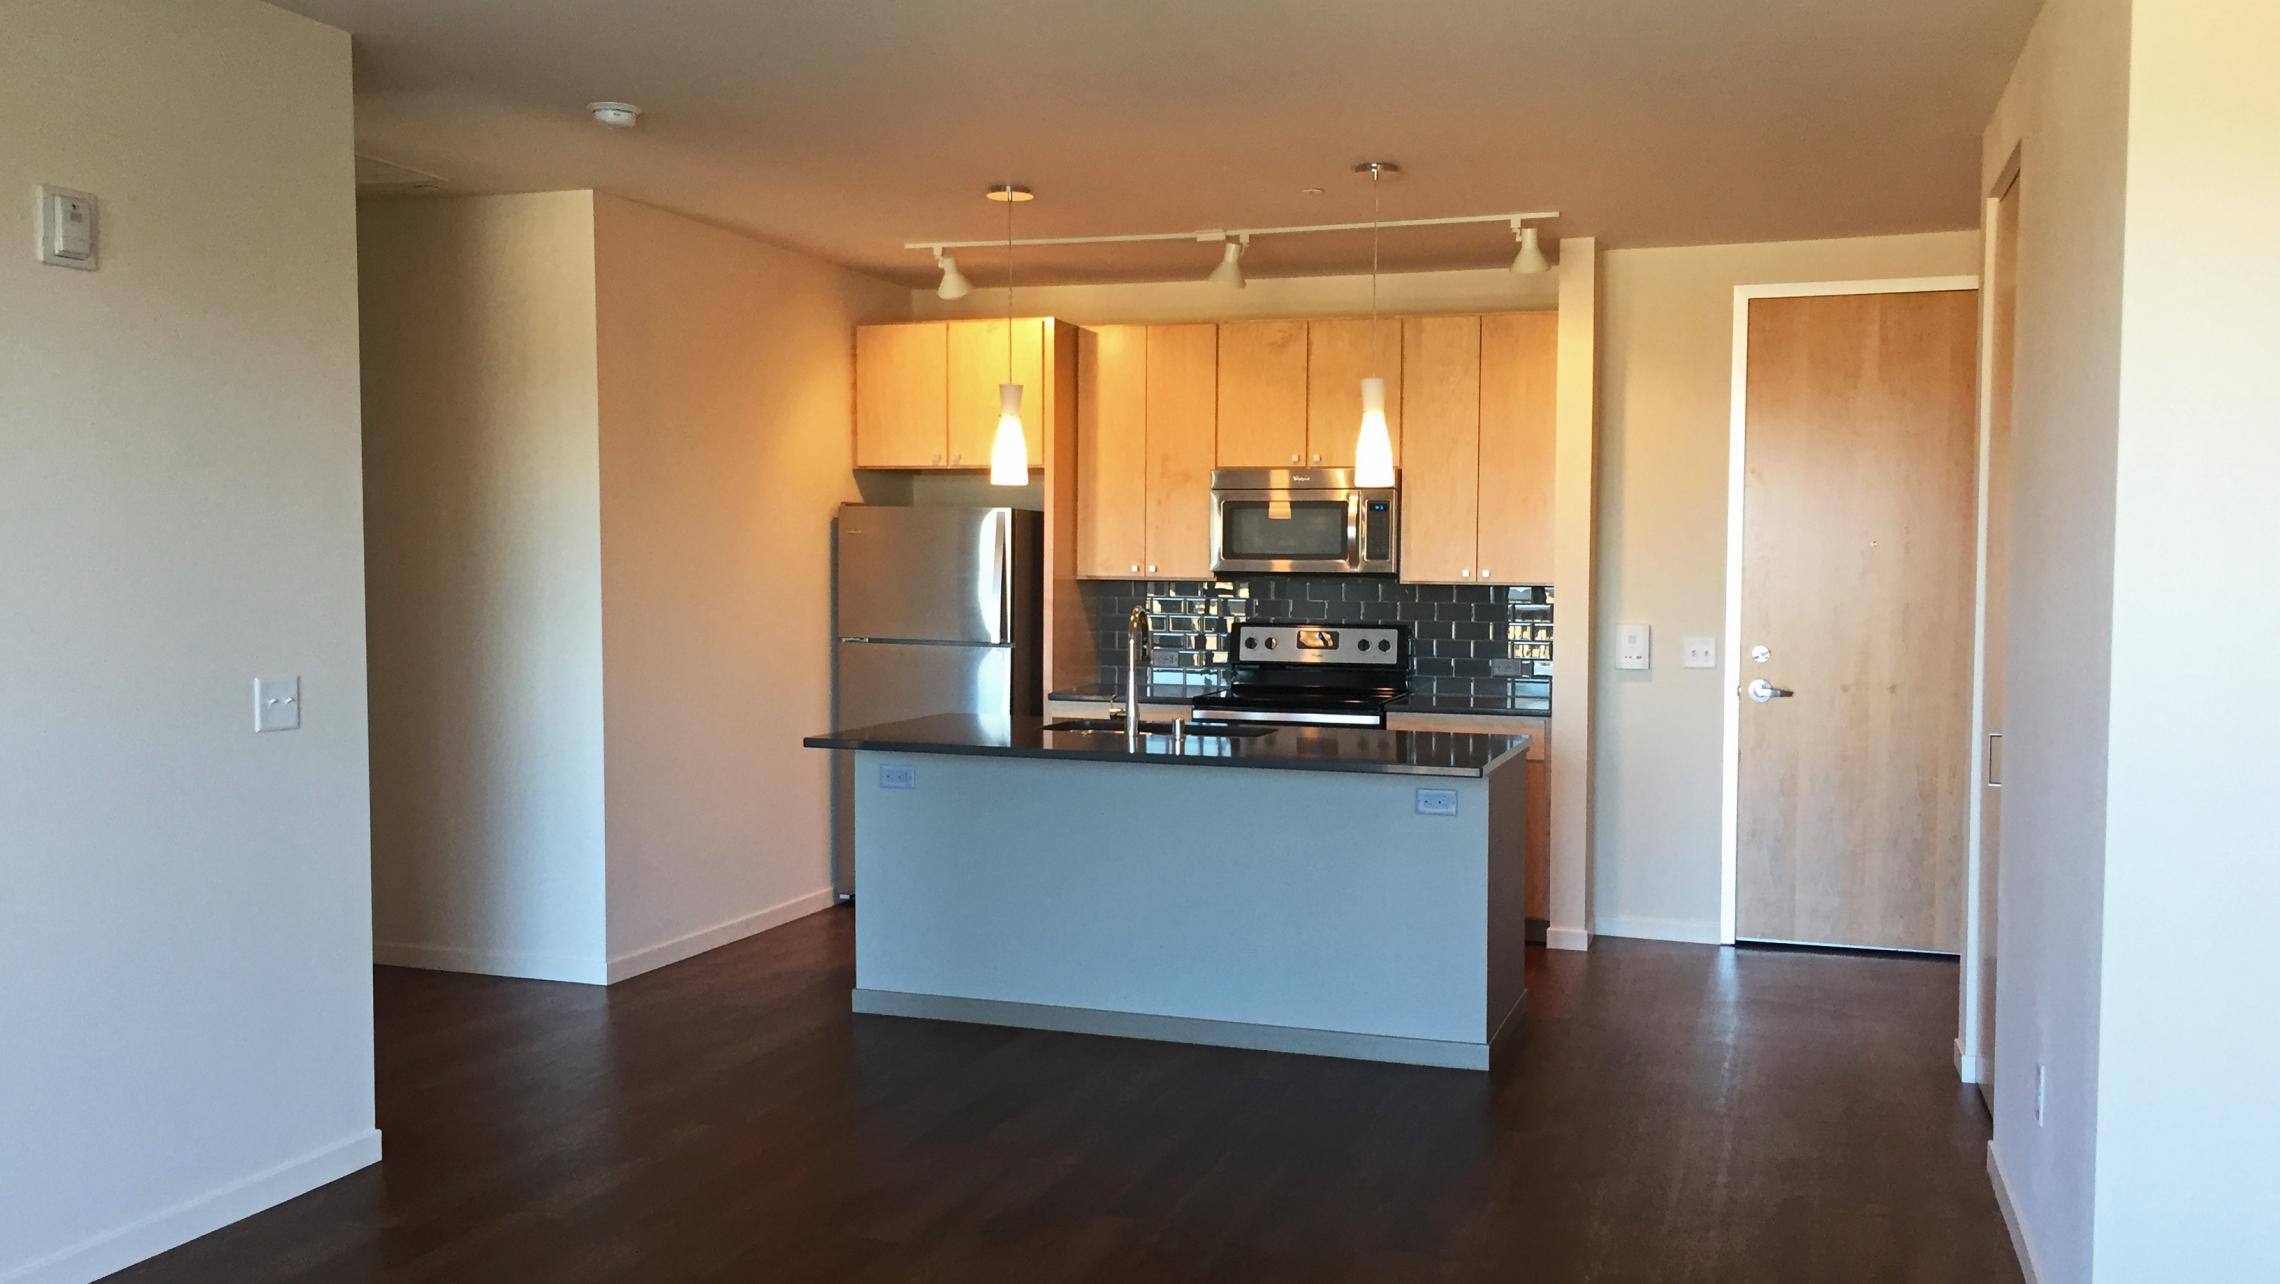 ULI Nine Line Apartment 420 - Kitchen